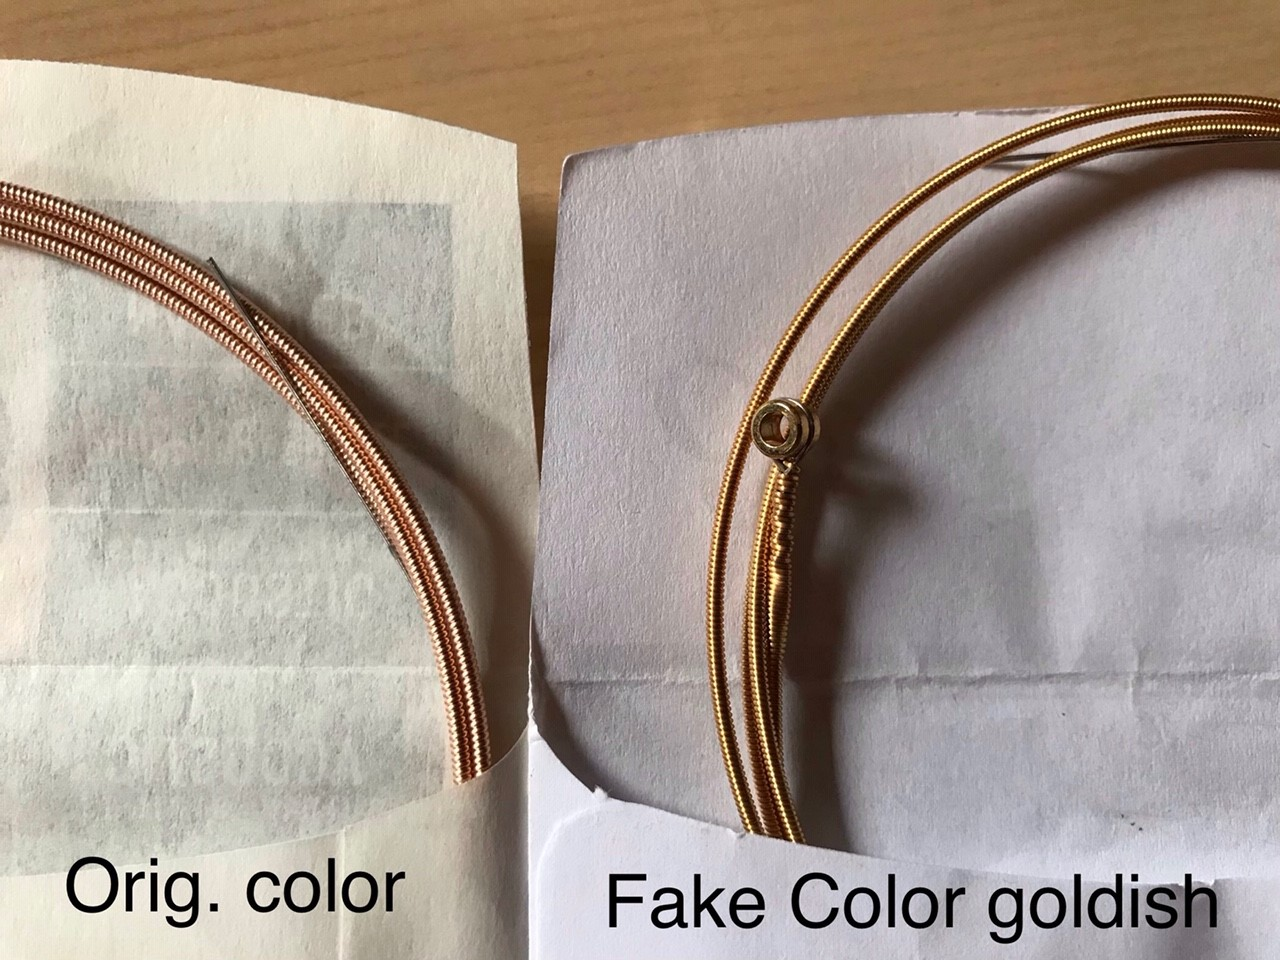 Bronzene Farbe beim Original, goldener Schimmer beim Fake